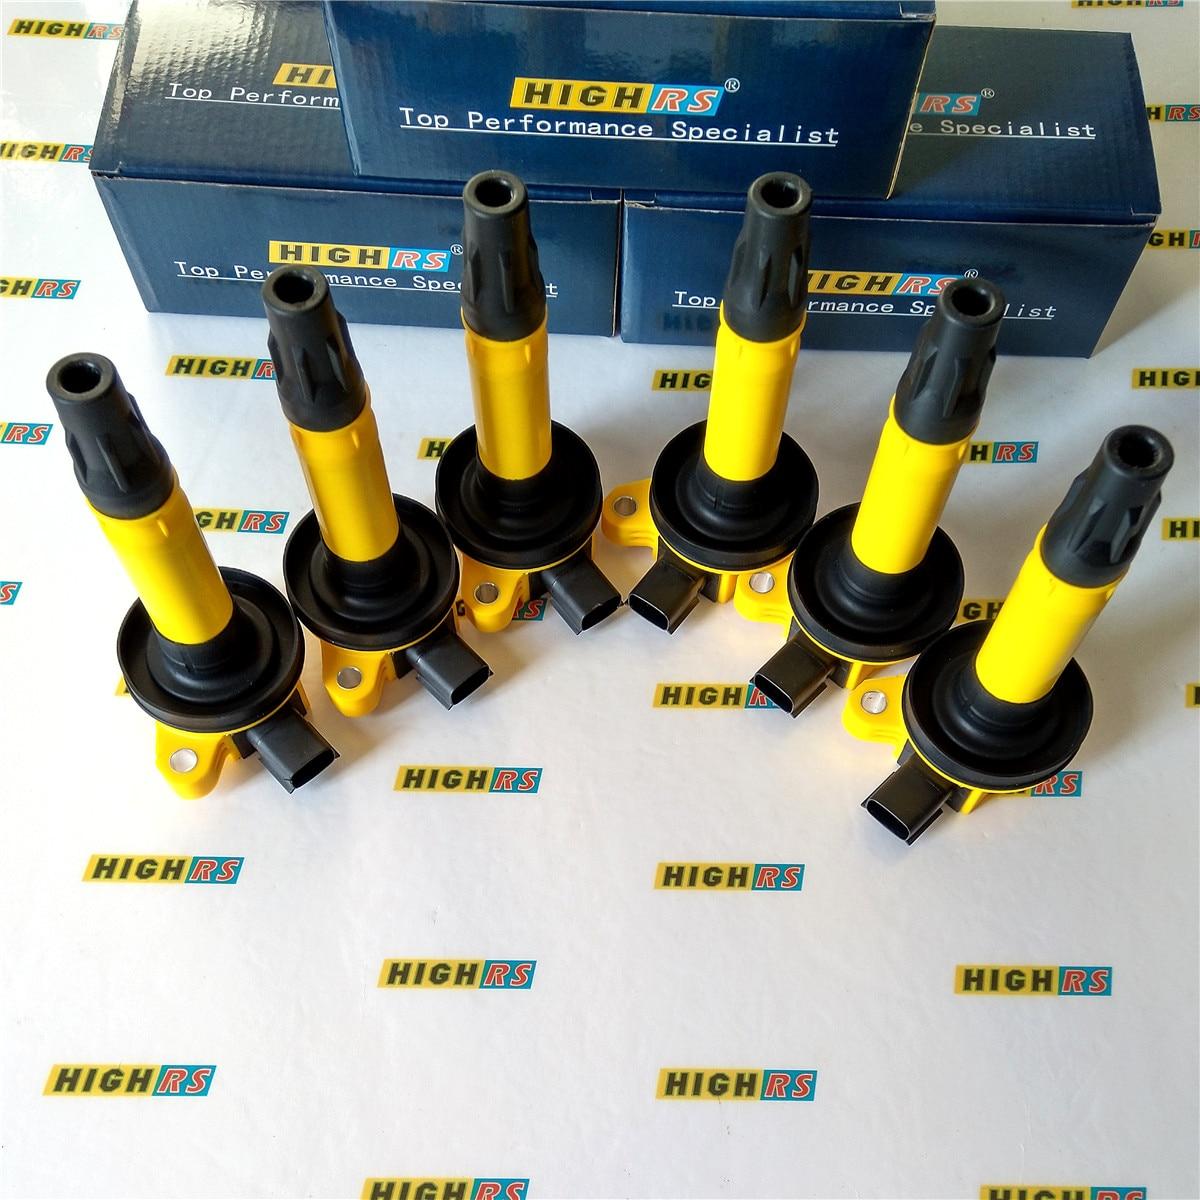 Bougie dallumage flexible FUSION F150, 6 bobines de PERFORMANCE MKZ MKX MKS MKT GN10237 DG520 DG-520